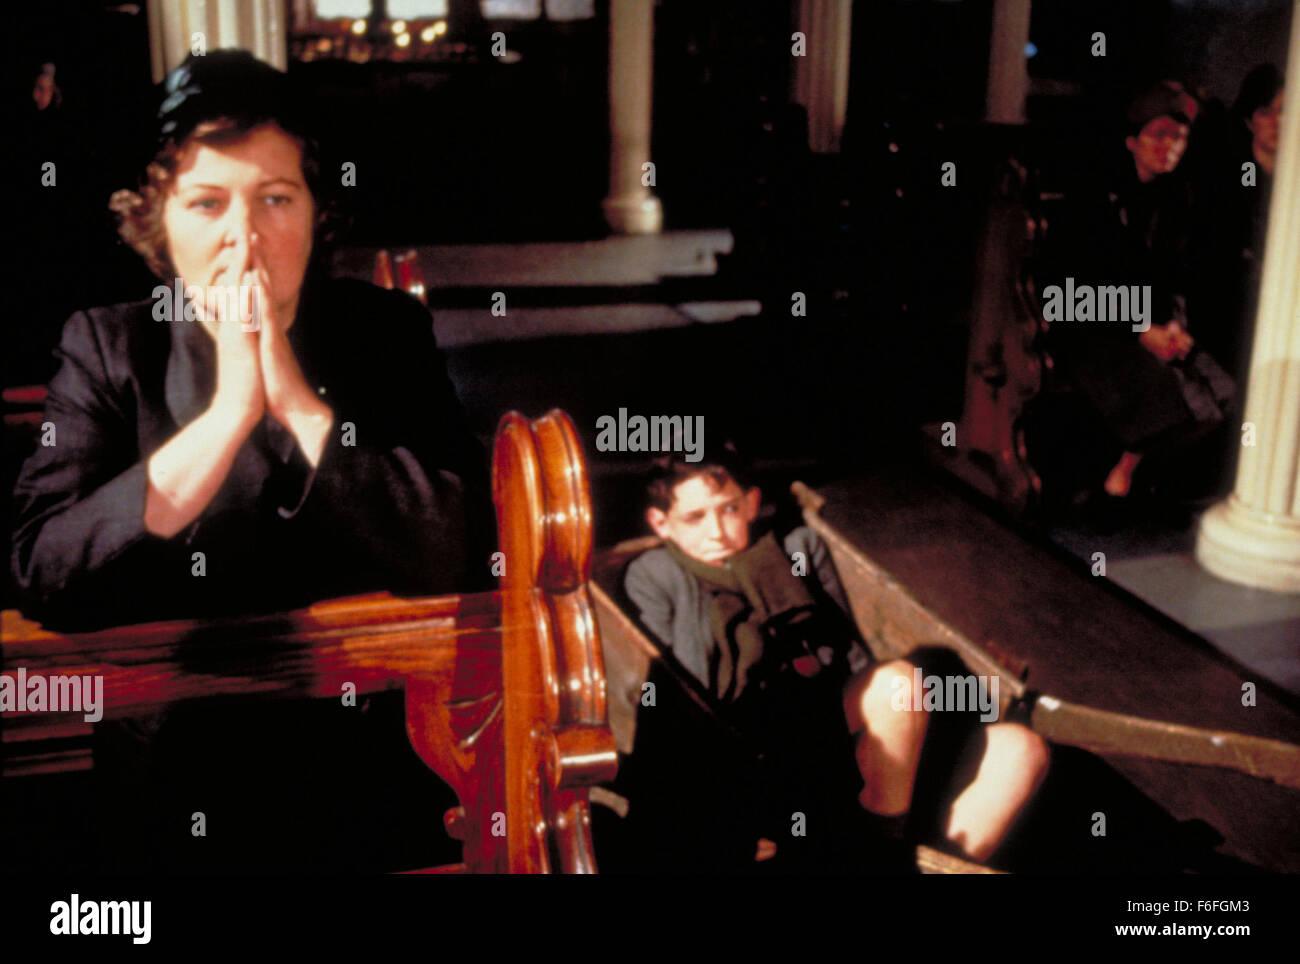 May 06, 1989; Hollywood, CA, USA; Image from director Jim Sheridan's biography drama 'My Left Foot' - Stock Image